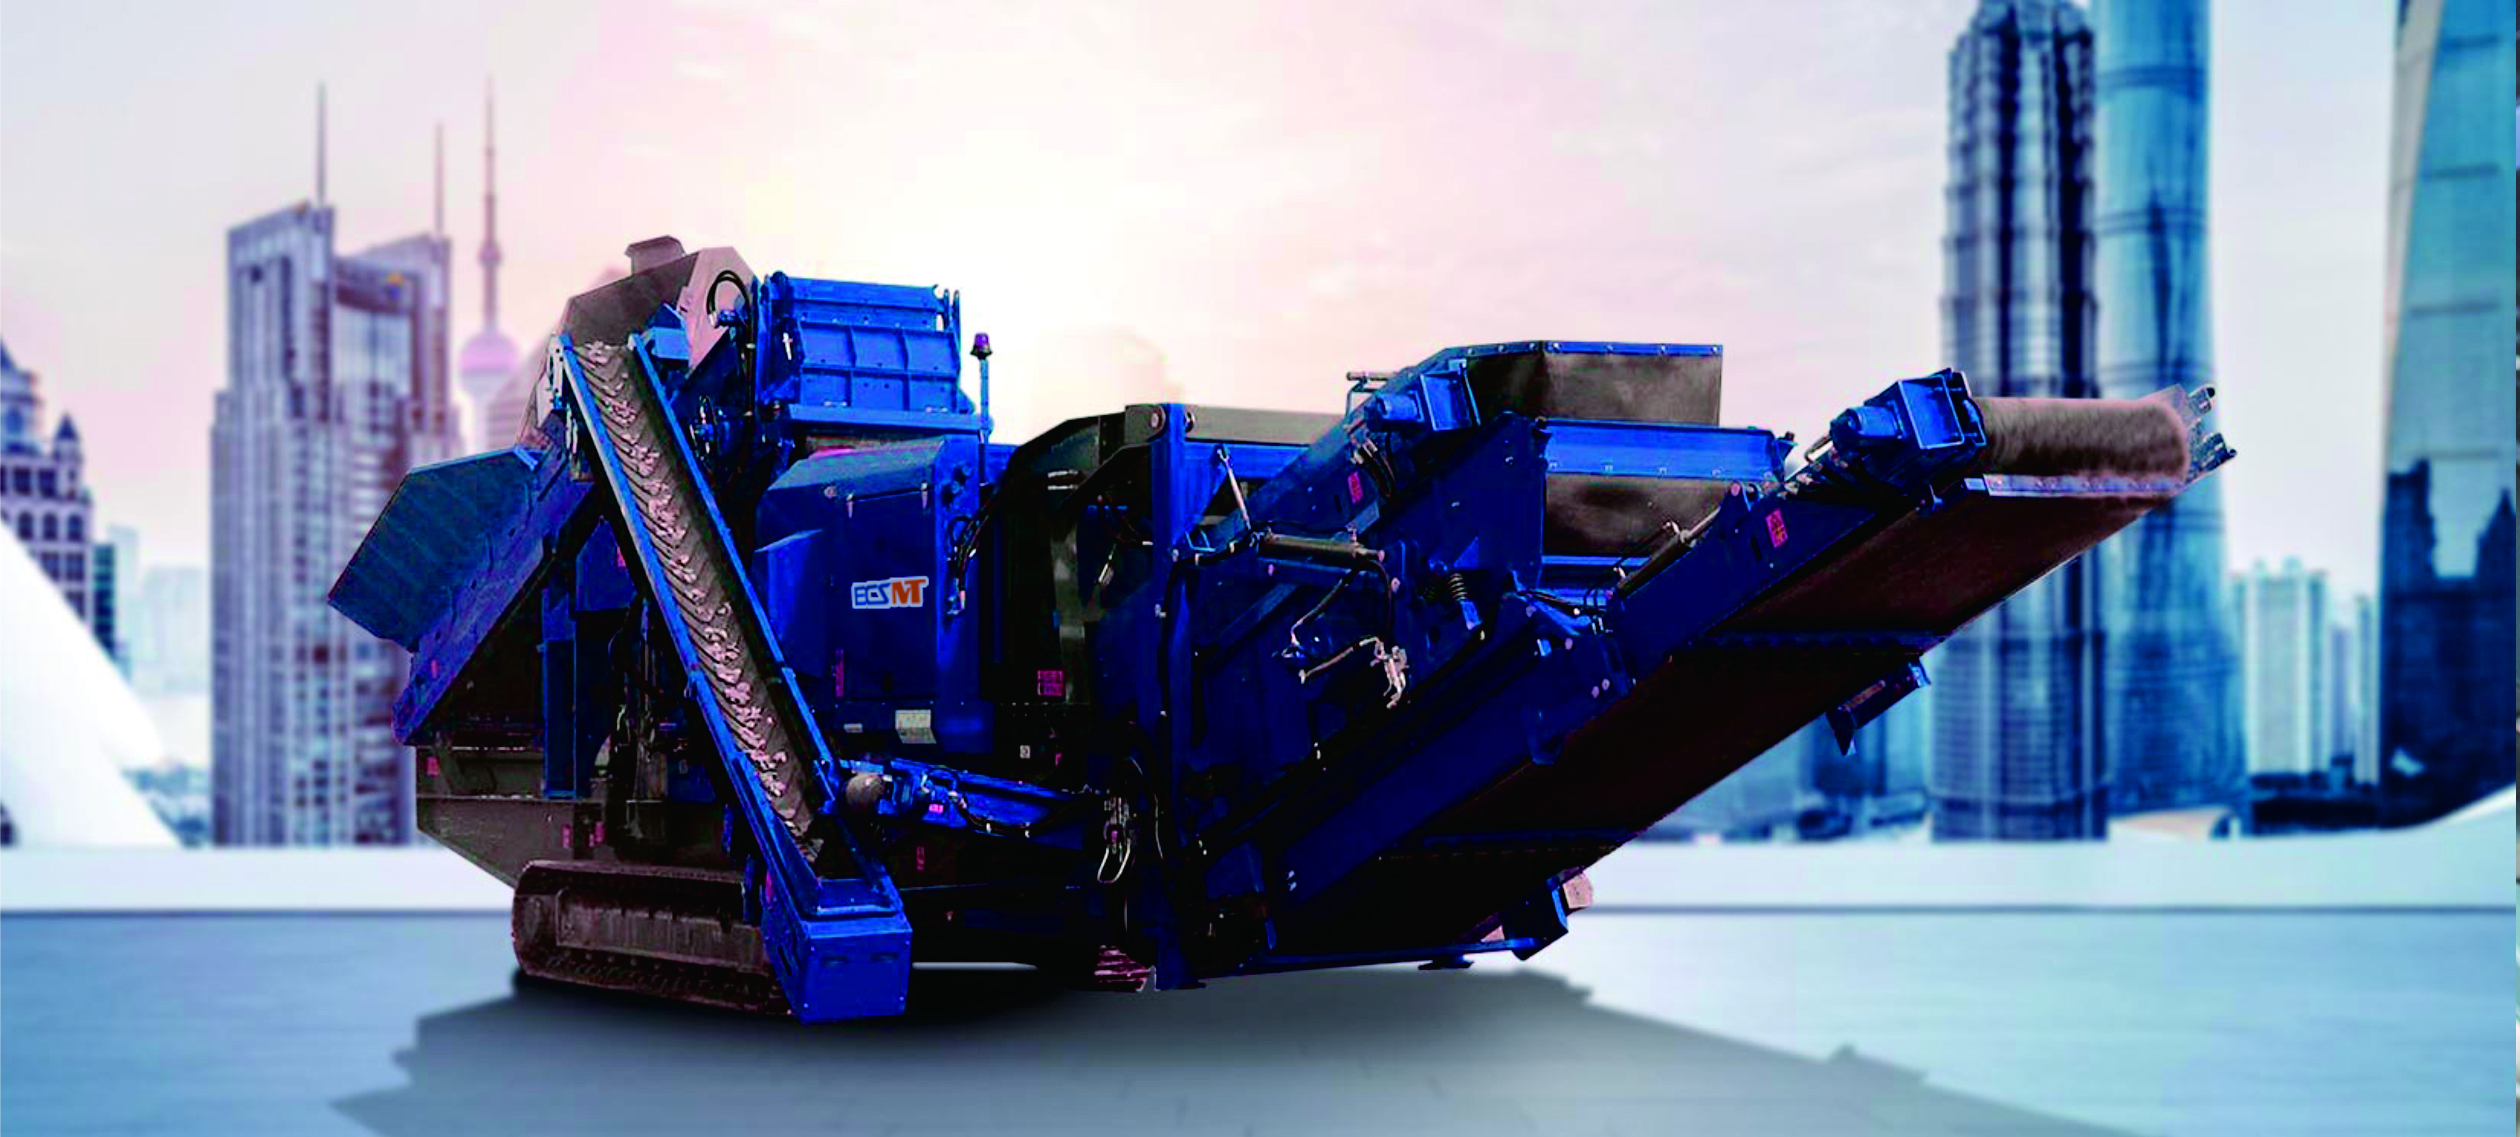 EMV200 (RS) Crawler Mobile Impact Trituradora - Máquina para fabricar arena